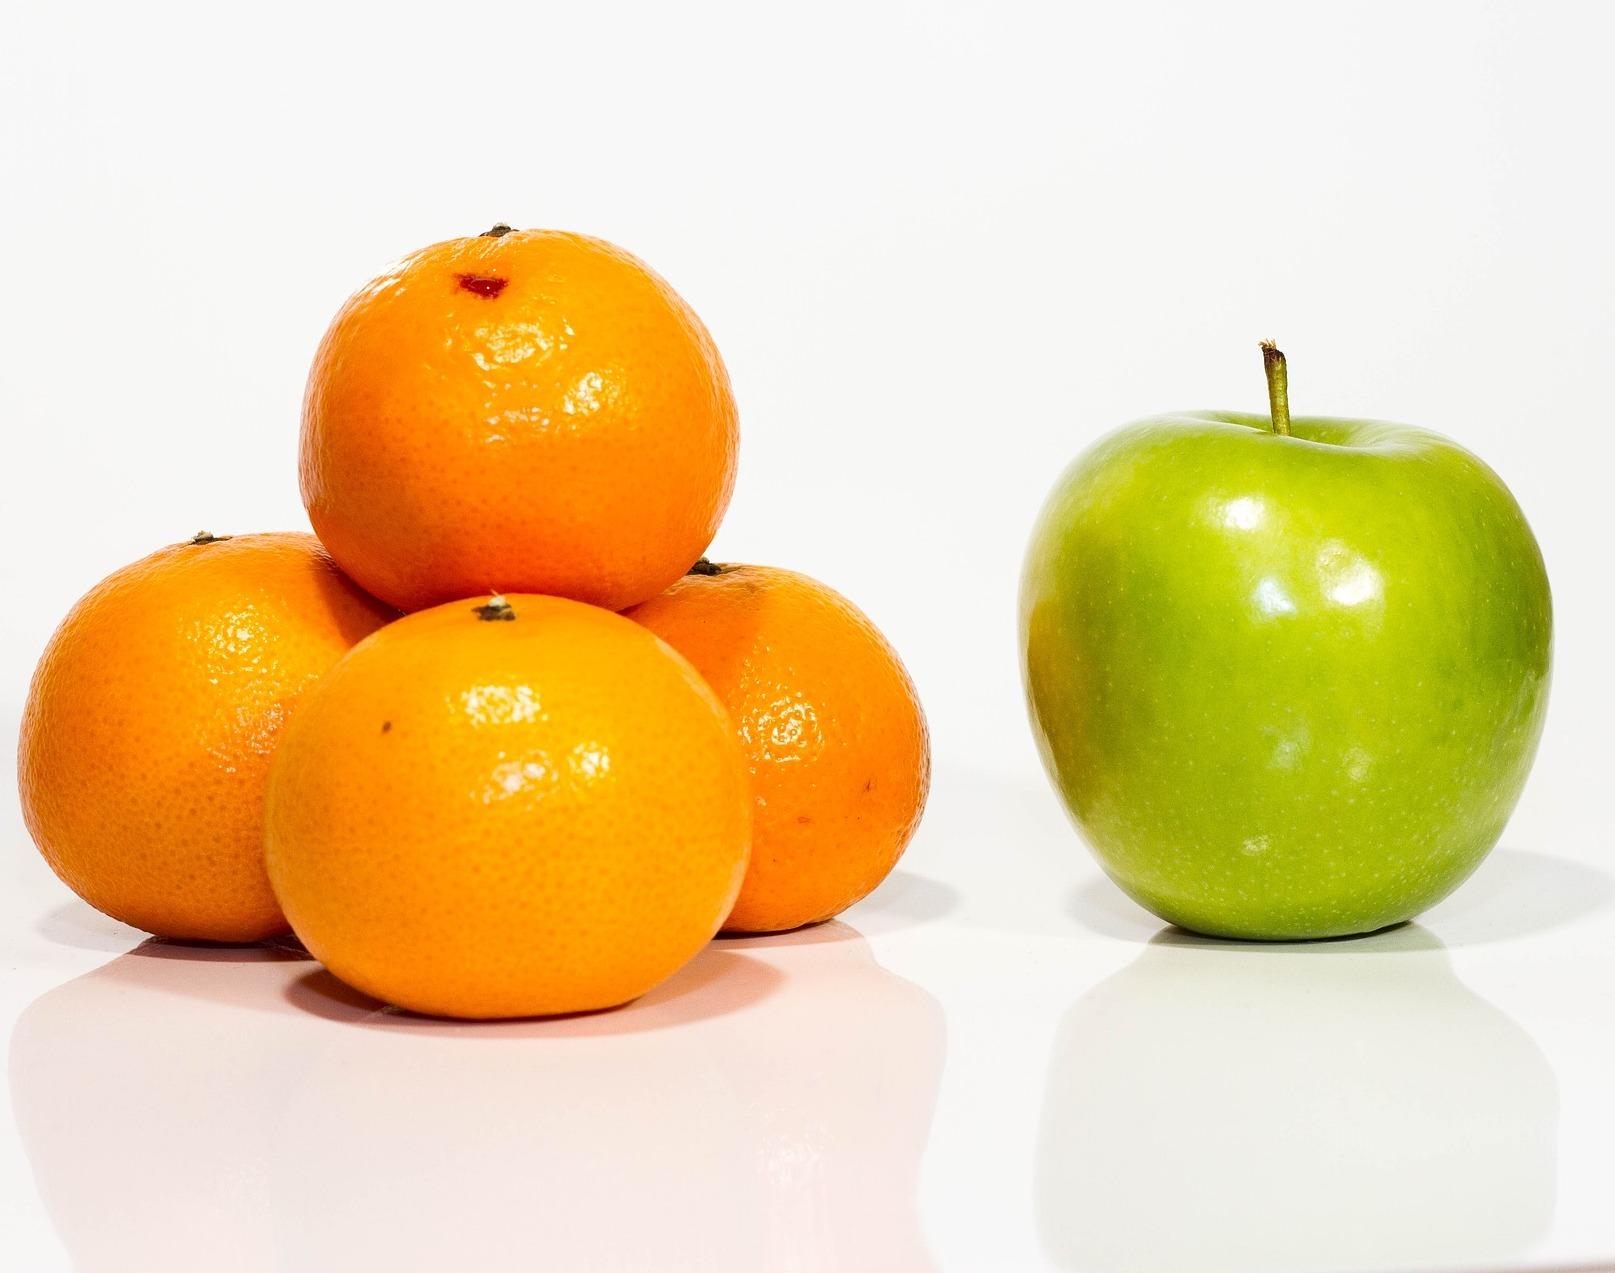 apple-1868383_1920-2.jpg